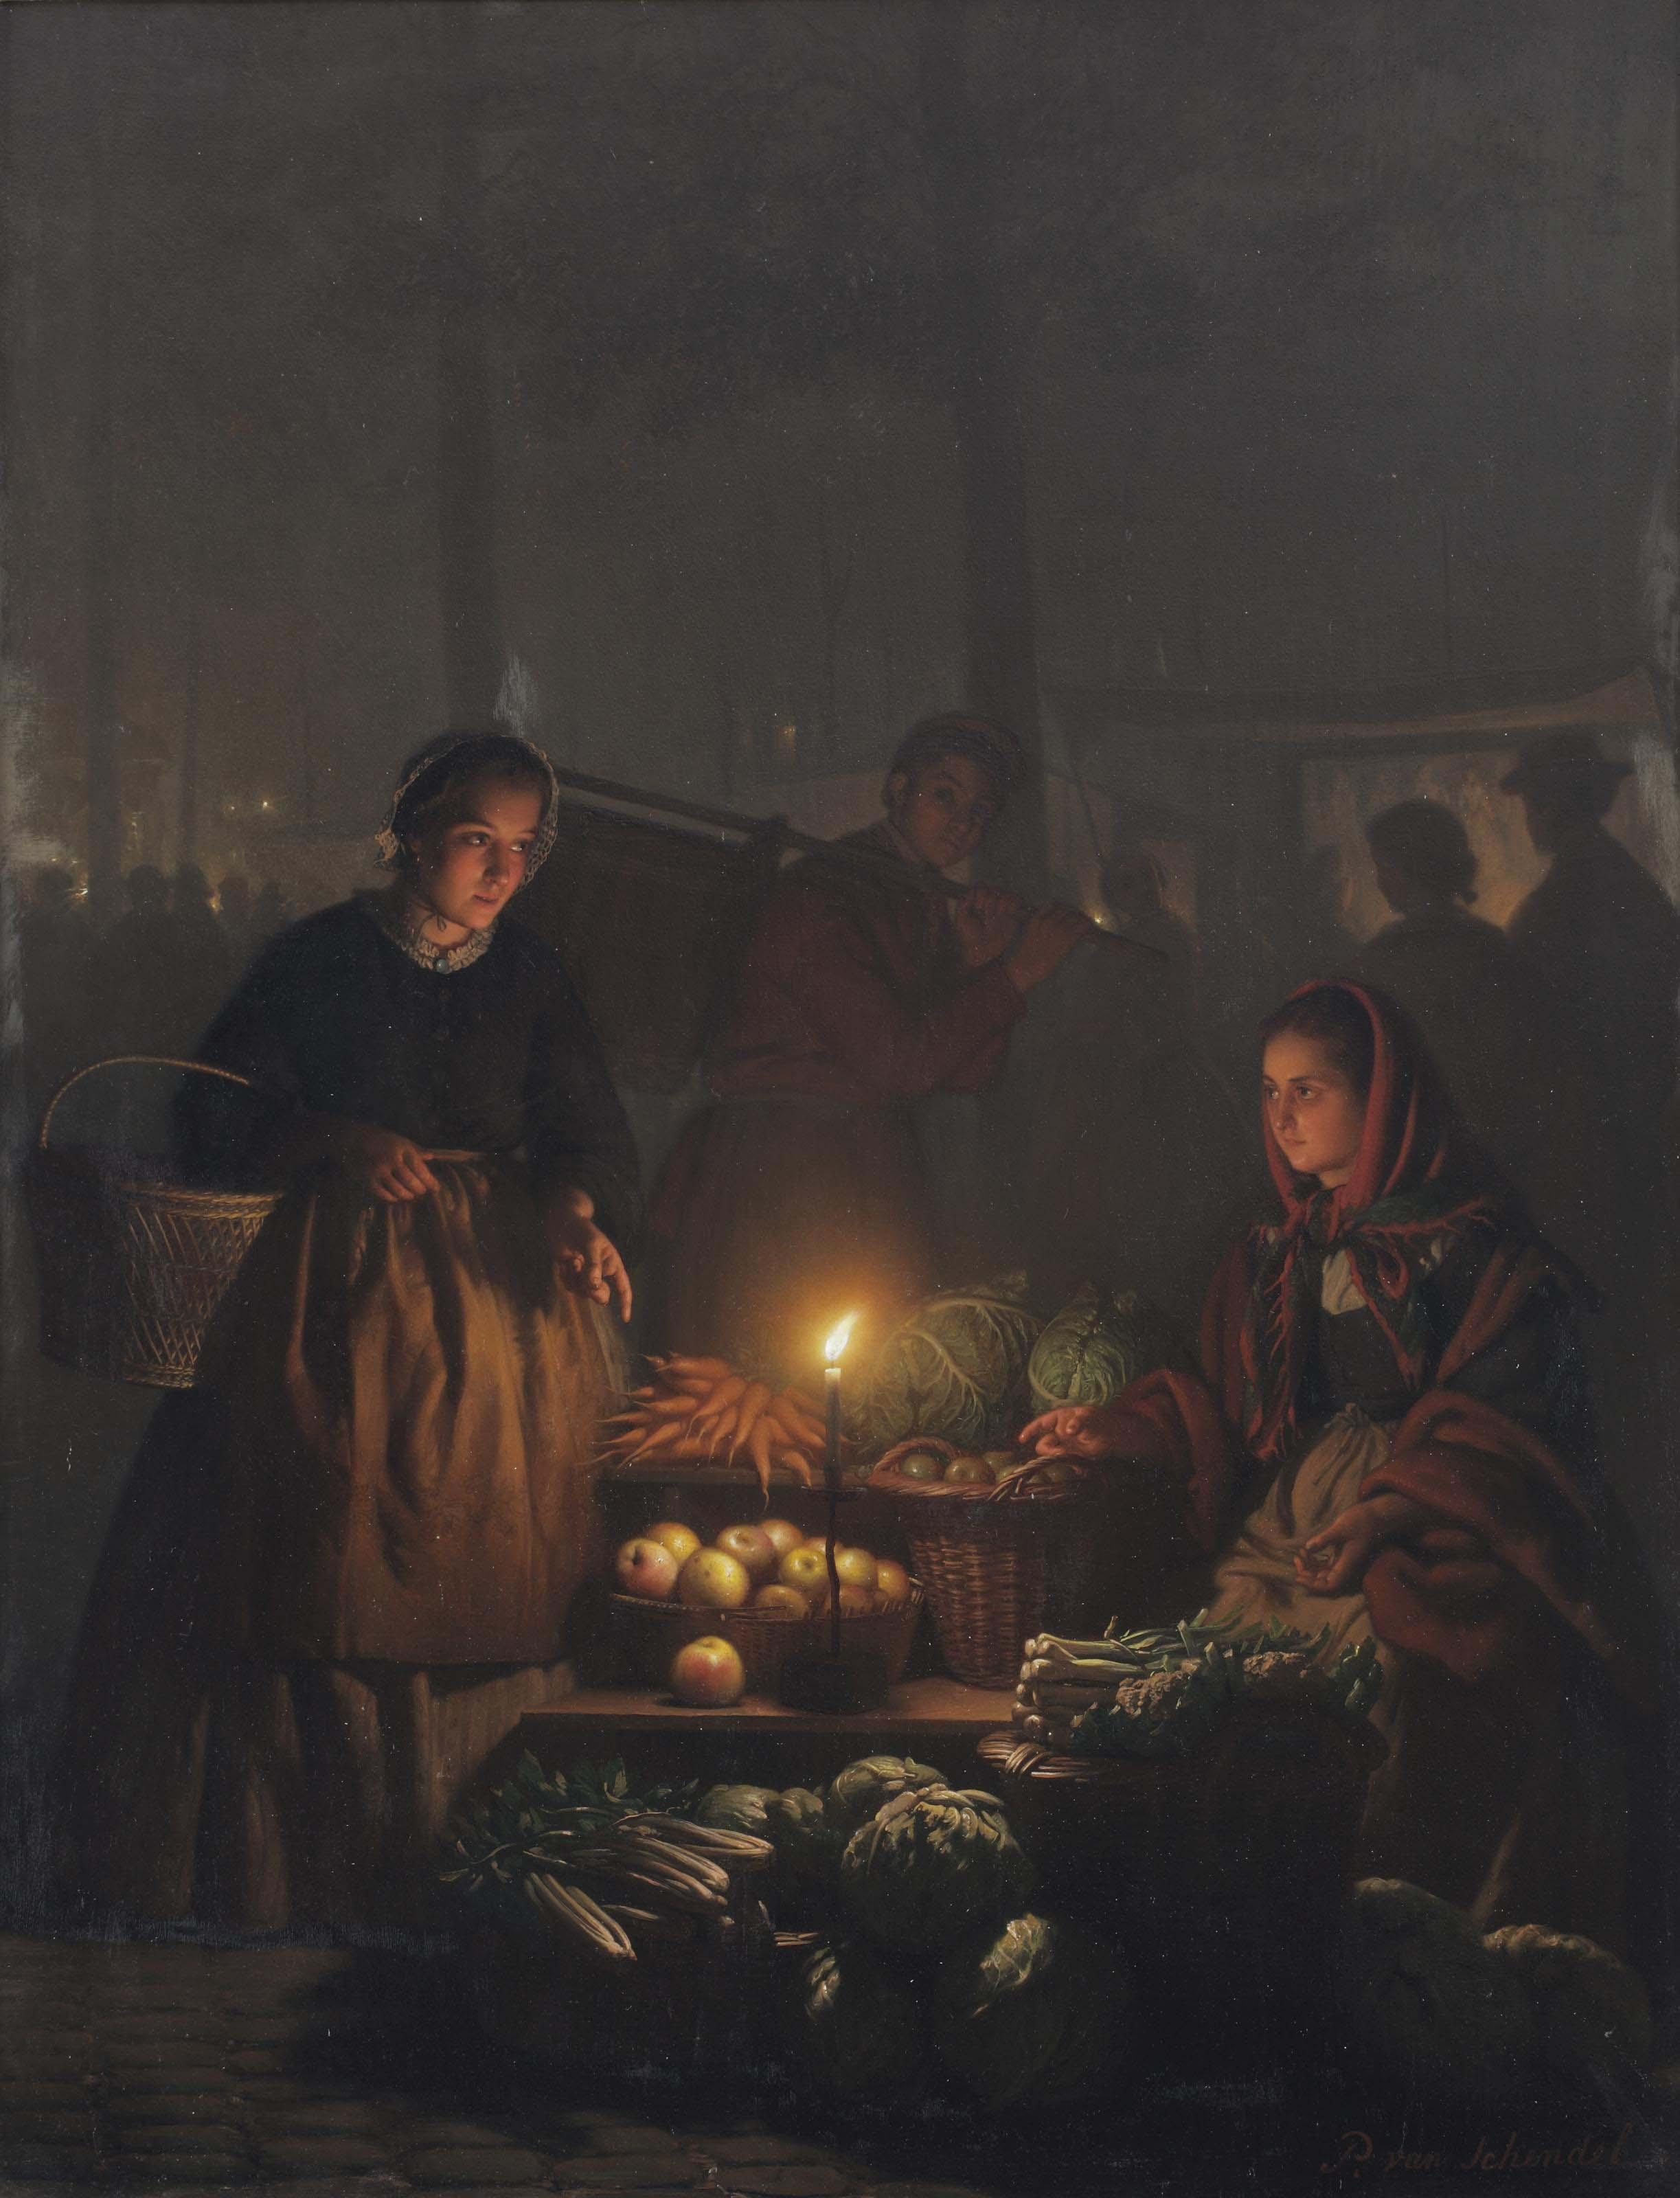 Groentemarkt bij avond: a vegetable seller offering her wares